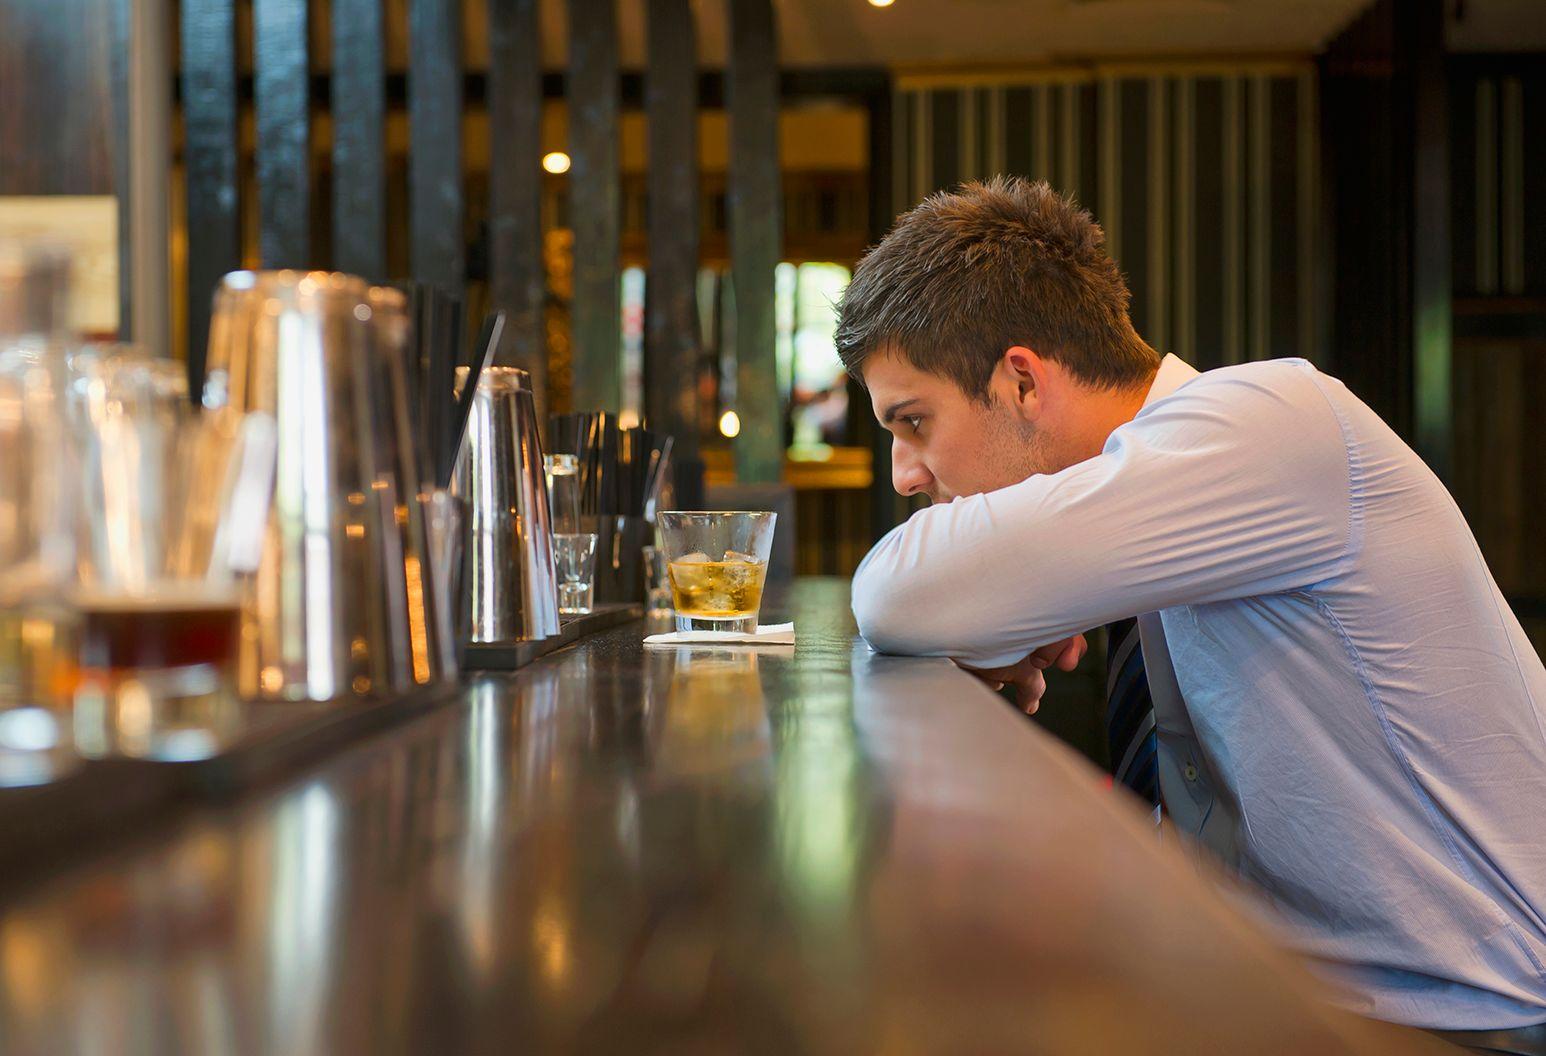 A man contemplates a drink at a bar.